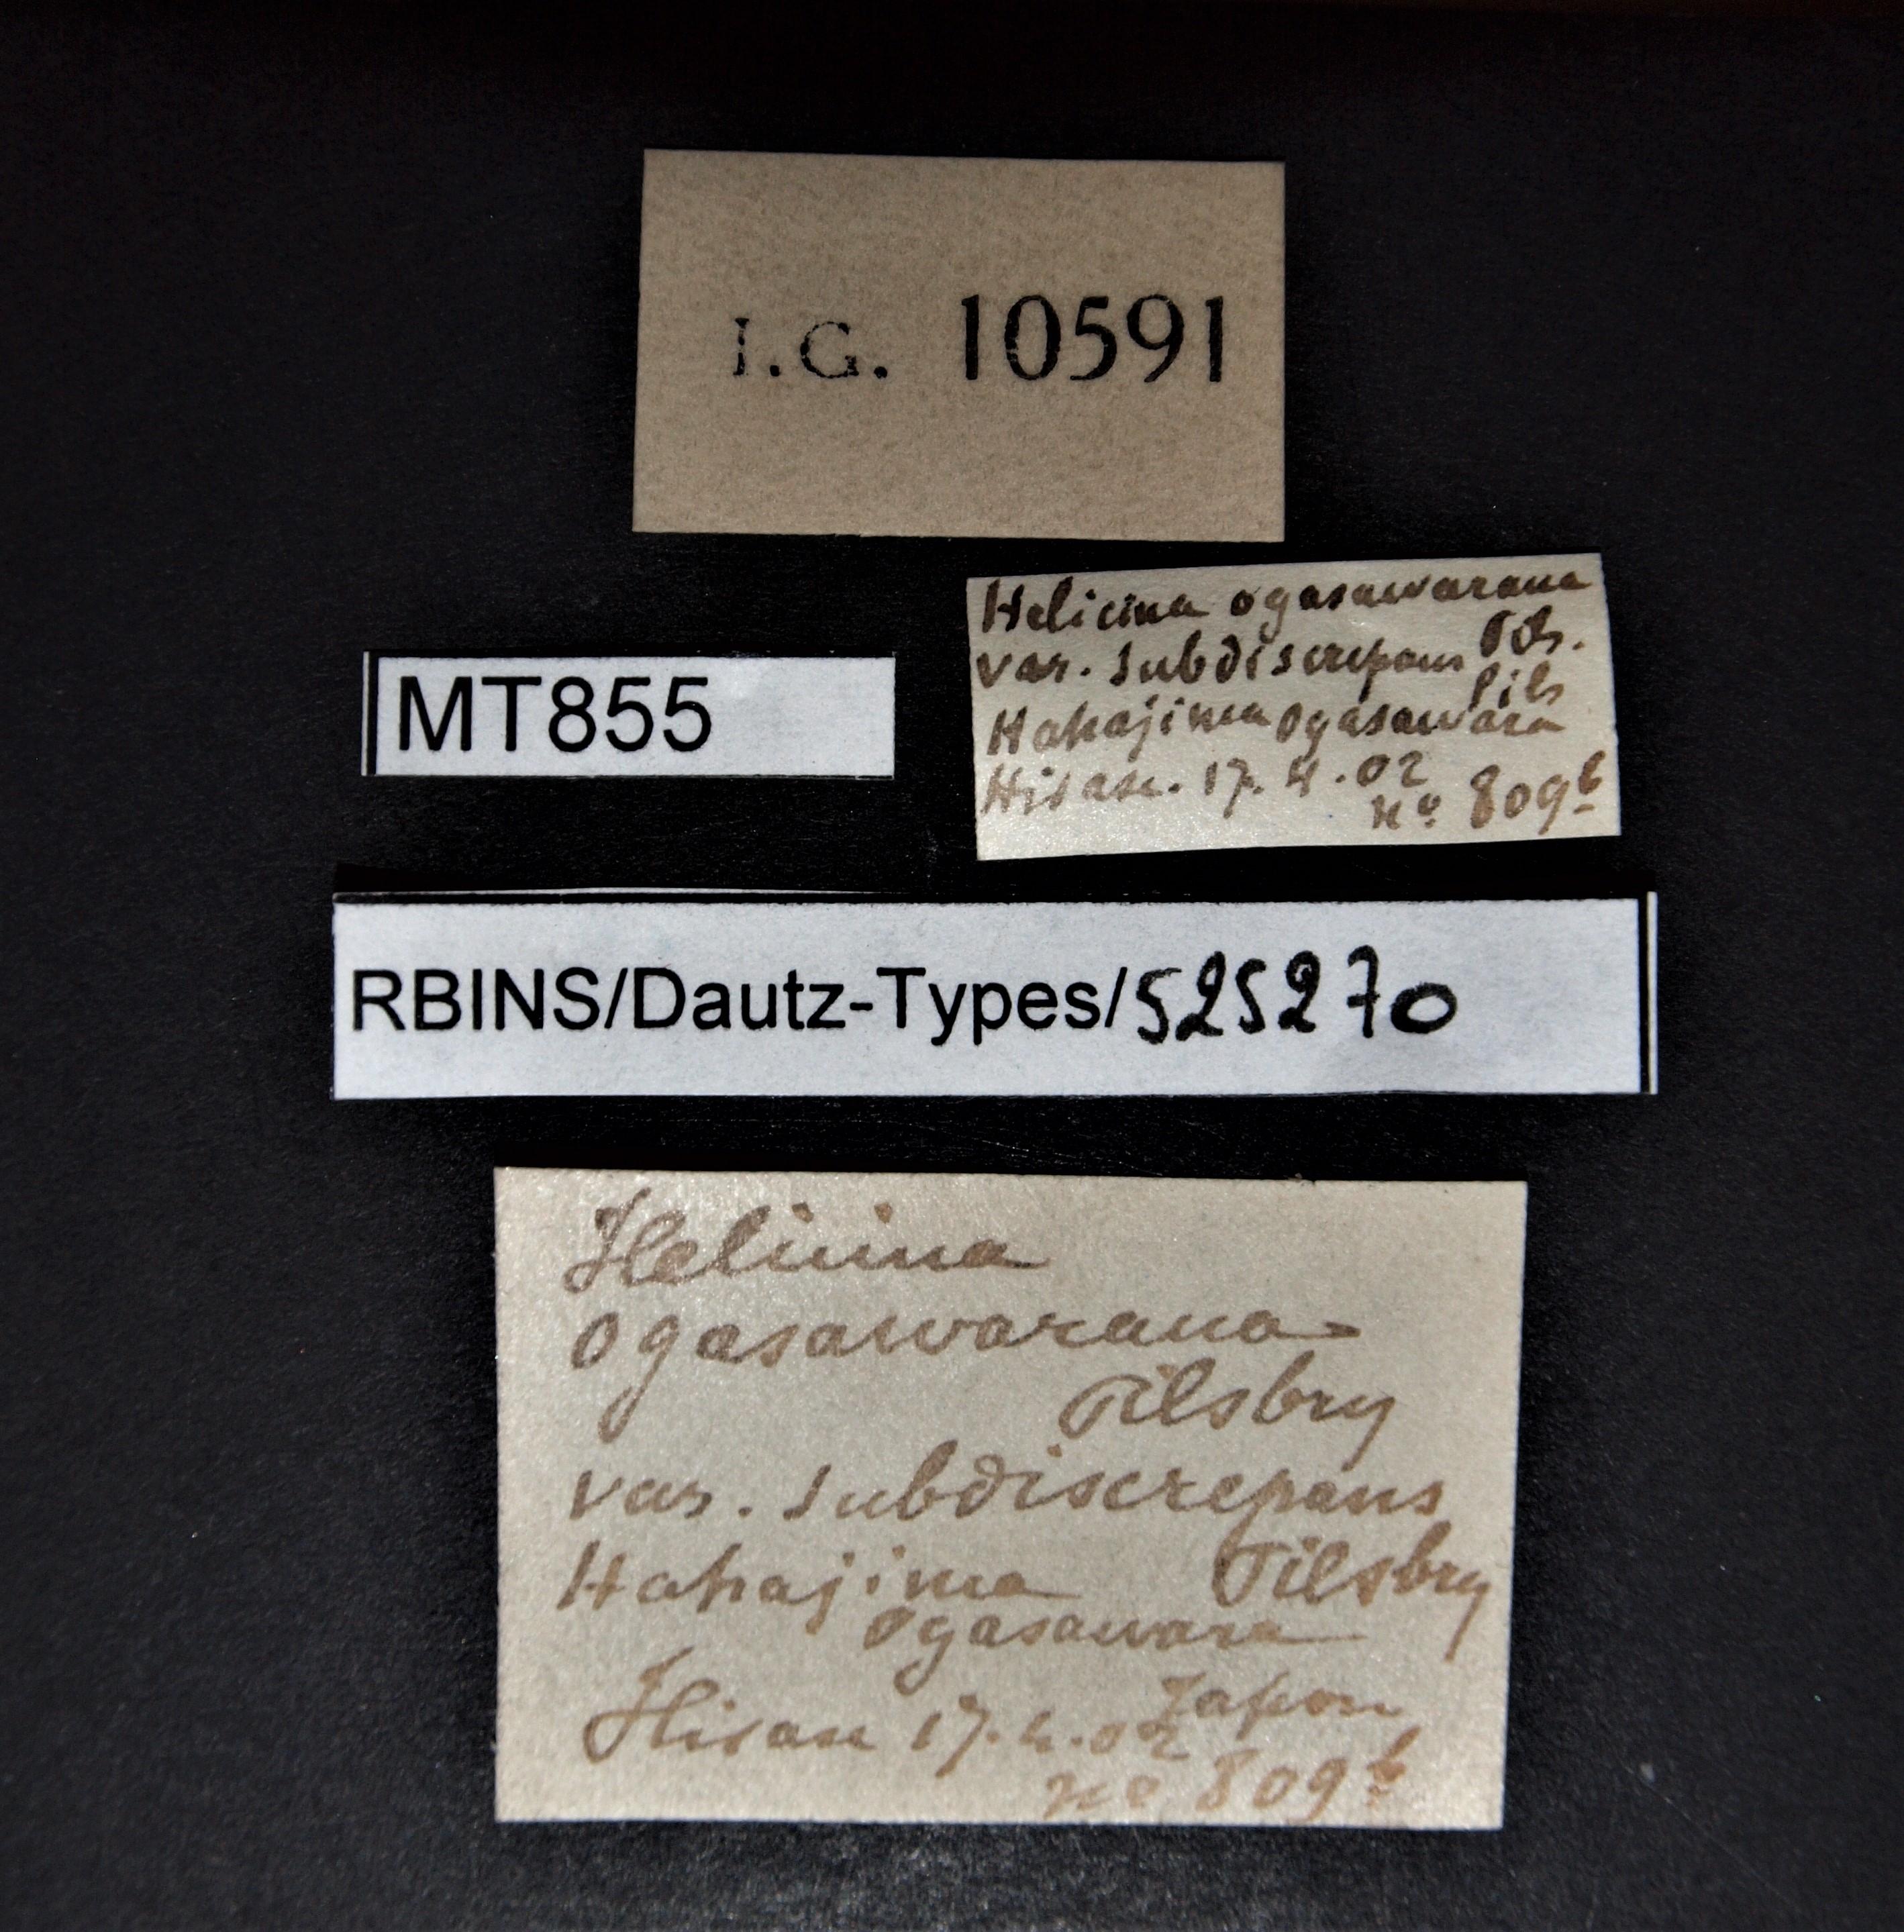 BE-RBINS-INV MT 855 Helicina ogasawarana var. subdiscrepans pt Lb.jpg